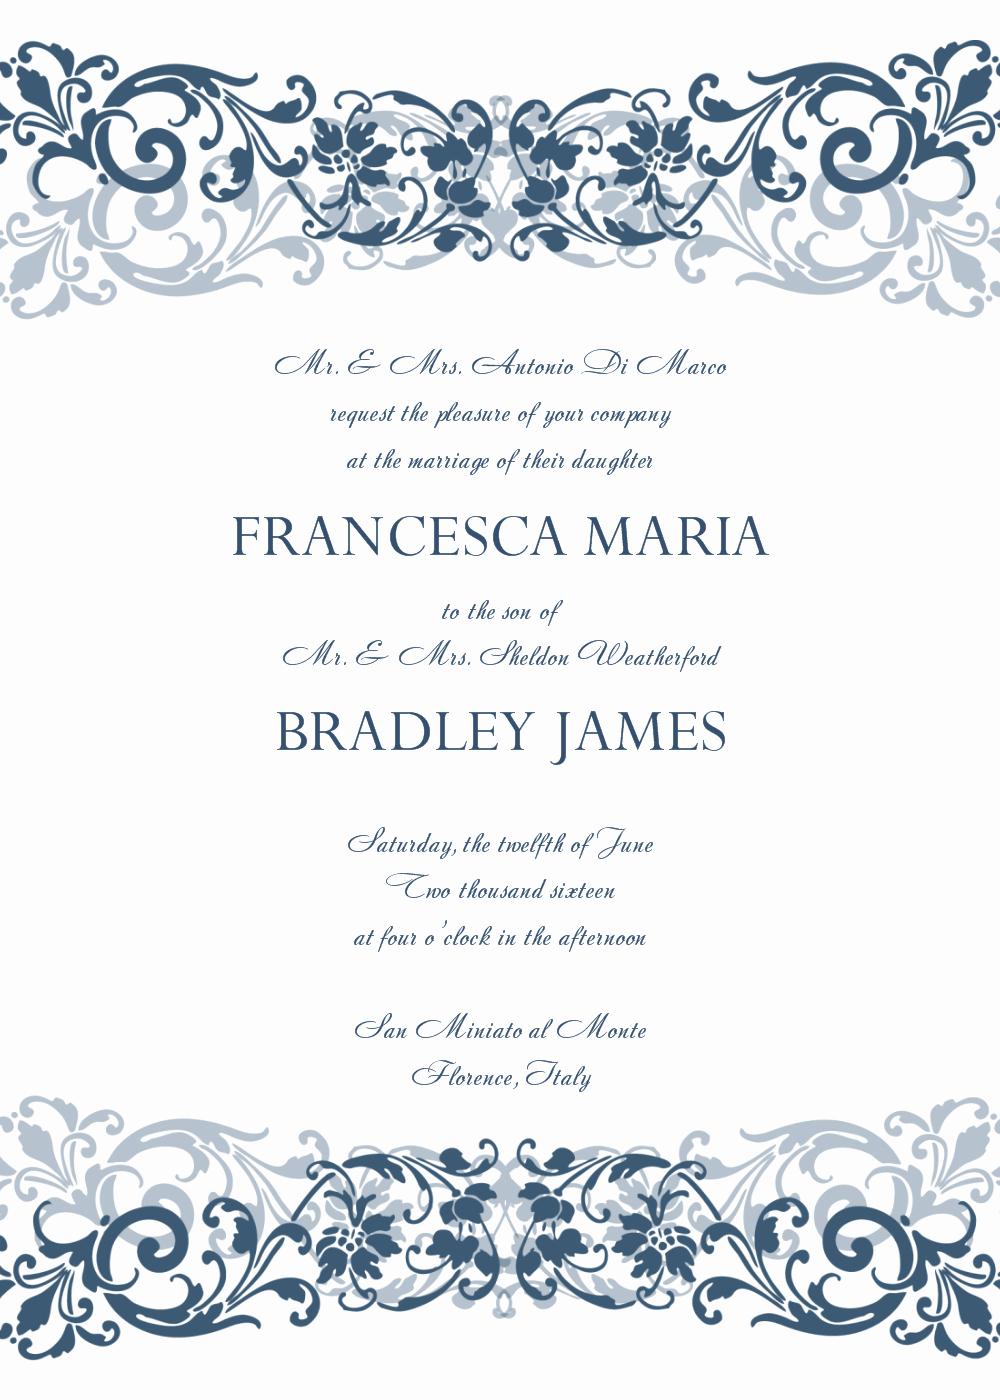 Wedding Invitation Design Ideas Beautiful Free Wedding Design Invitation Template